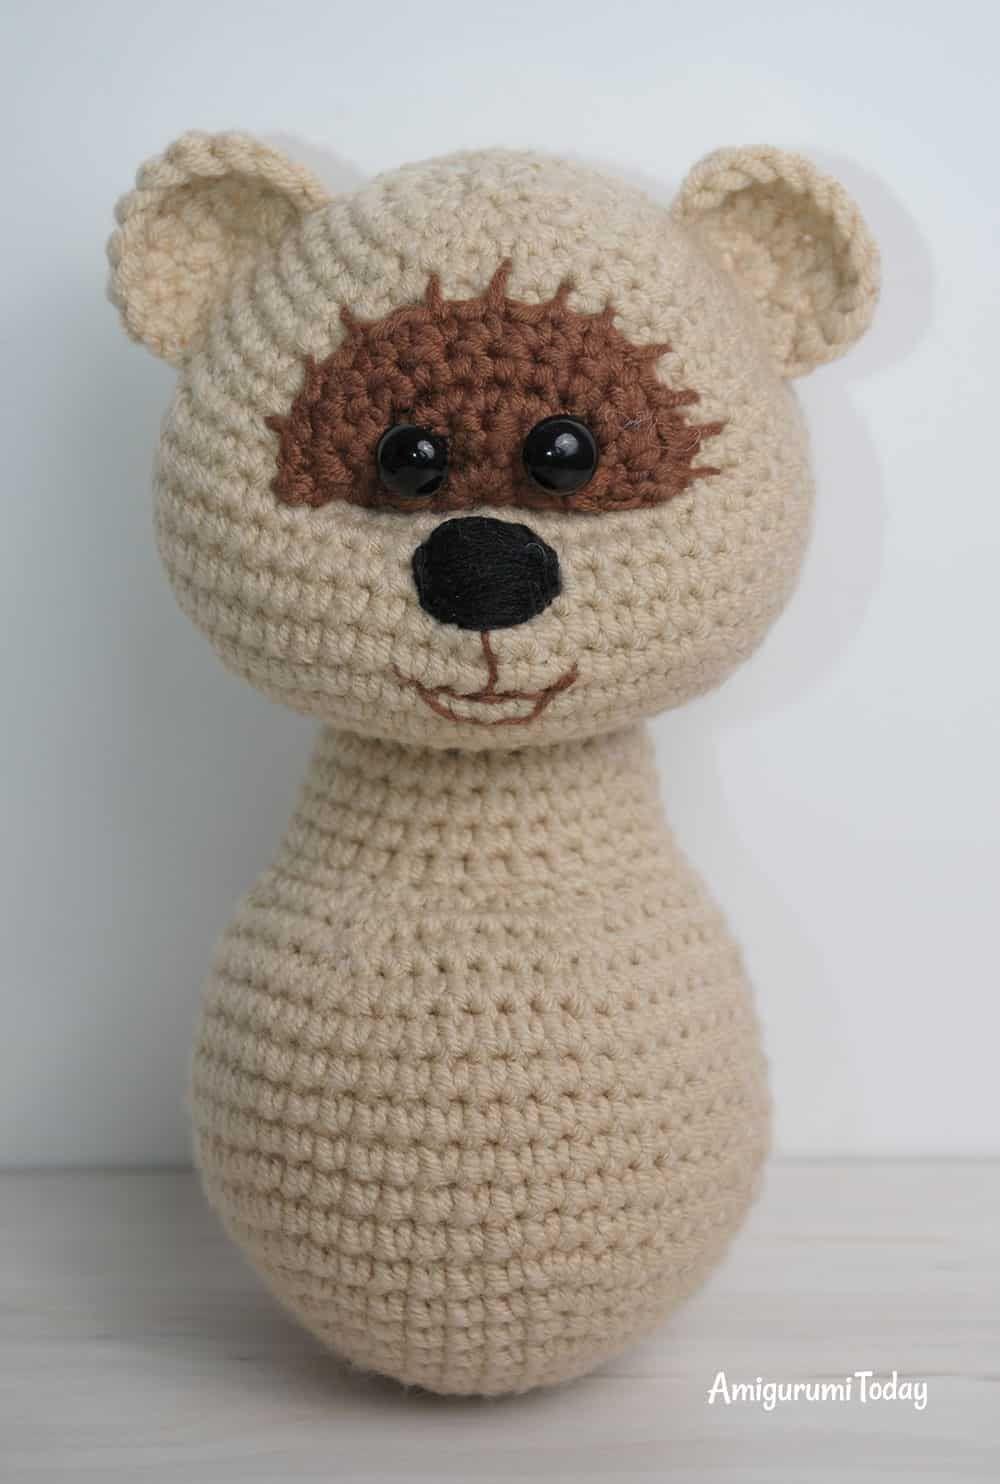 Amigurumi honey teddy bears - patrón libre | oso mielero | Pinterest ...